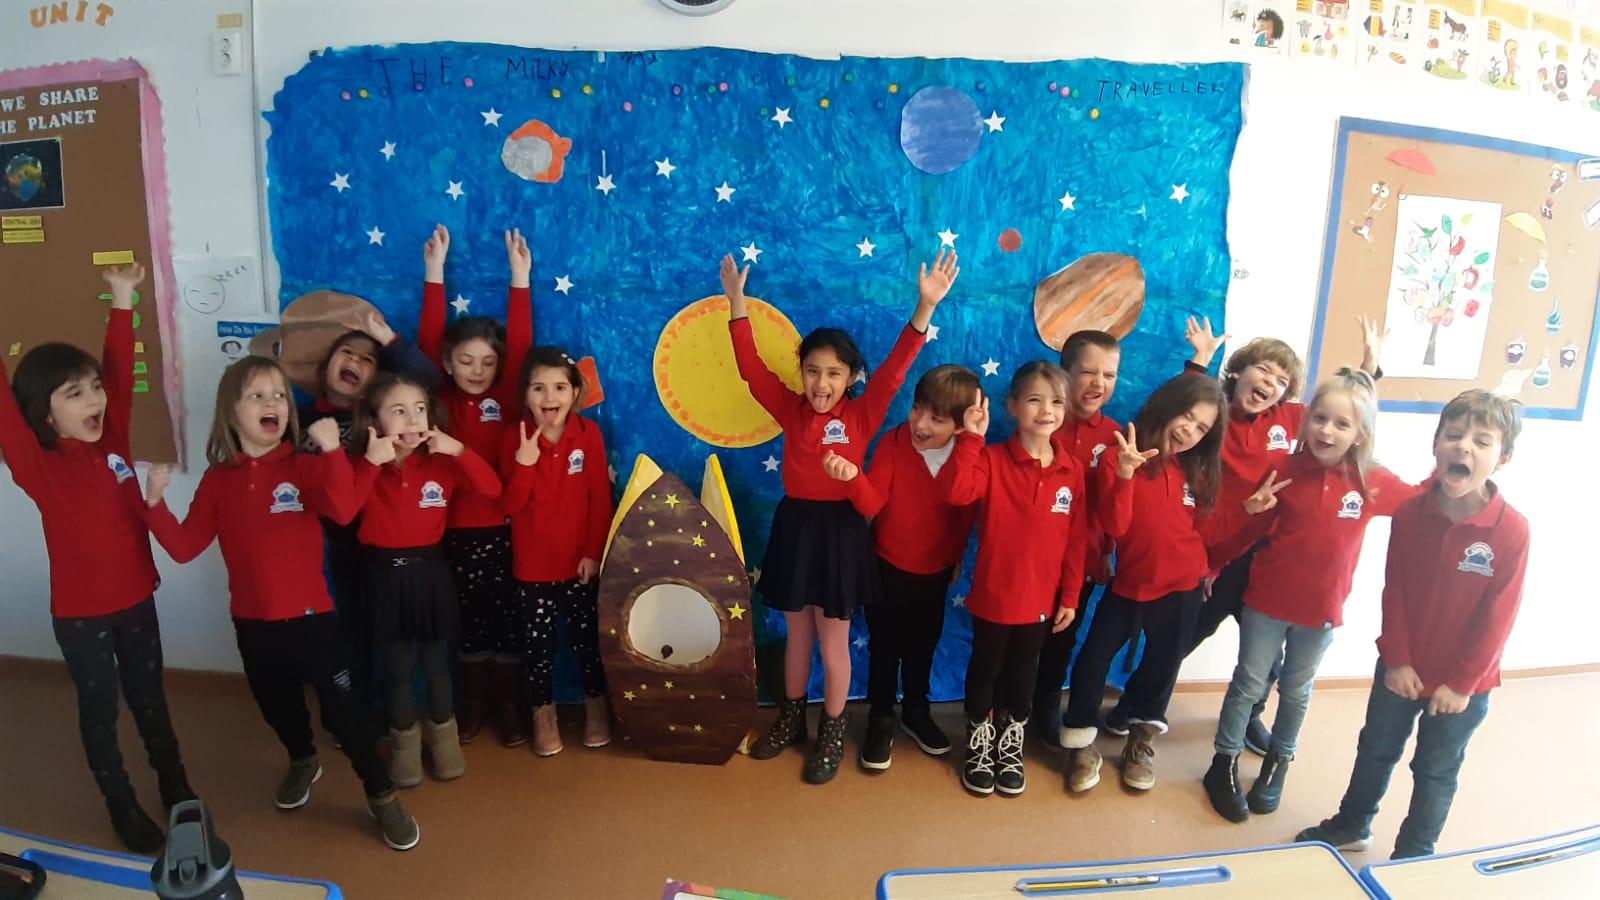 Programul IB – PYP (Primary Years Programme) integrat în curriculum românesc